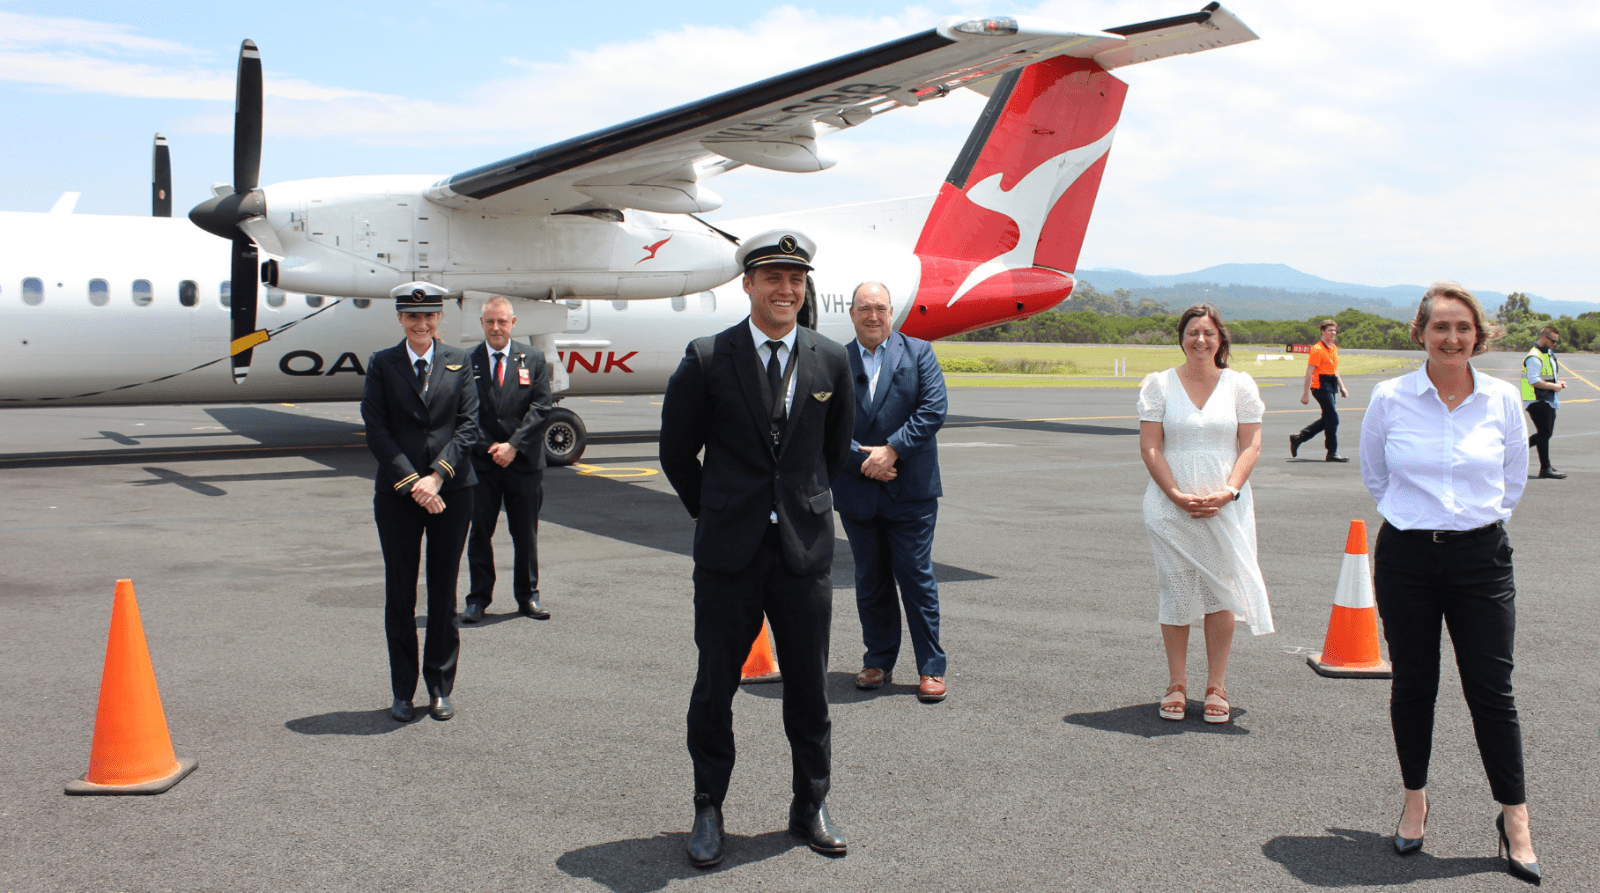 Qantas flight crew with Mayor Fitzpatrick, Member for Eden-Mondaro, Kristy McBain and Qantas Group CFO, Vanessa Hudson.